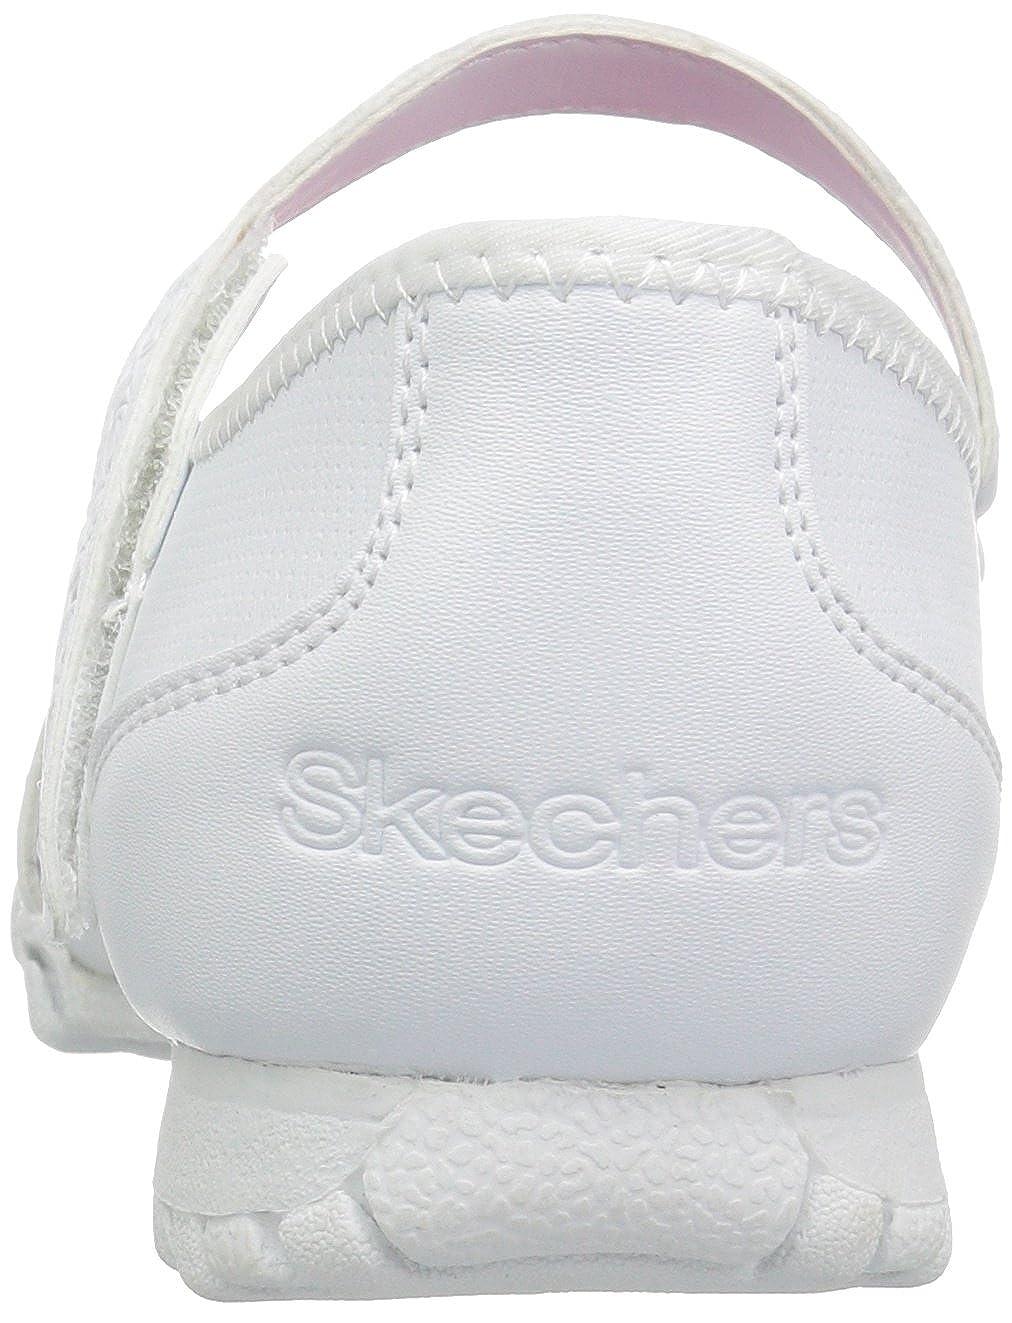 Skechers Kids Girls Kids' Biker II-Campus Jane Craze Mary Jane II-Campus d31482